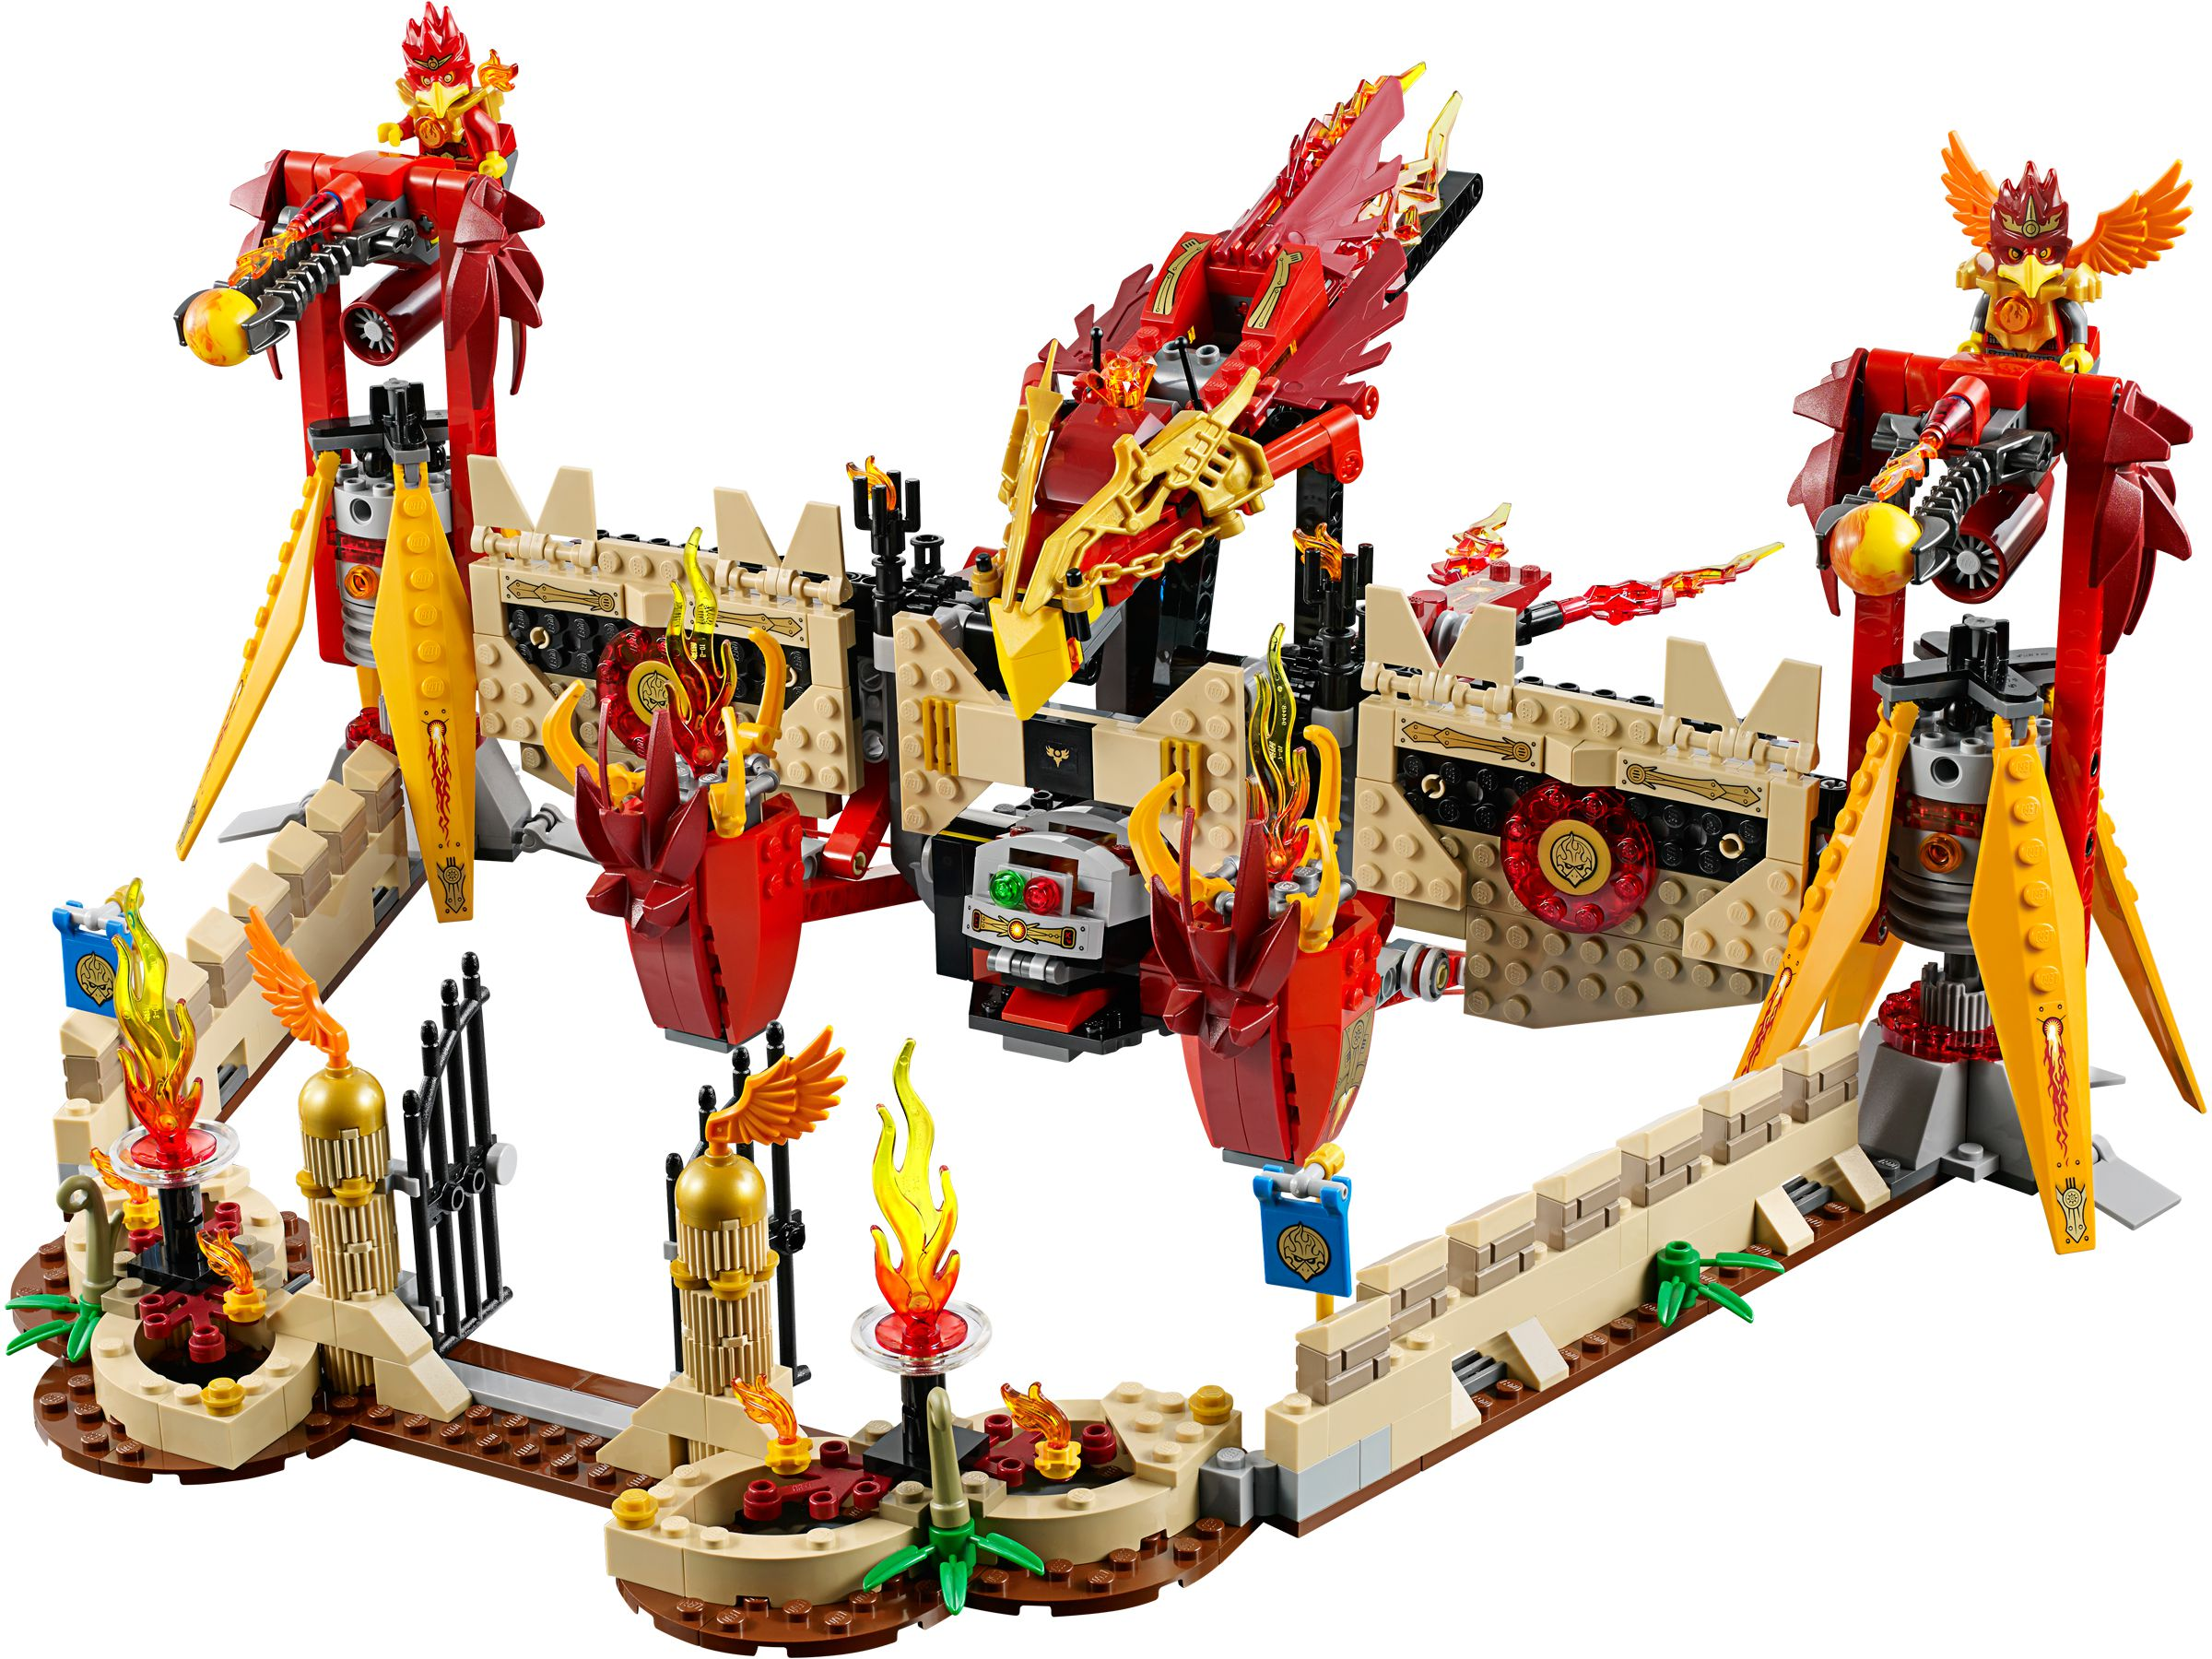 Lego 70146 phoenix fliegender feuertempel legends of chima 2014 flying phoenix fire temple - Image de lego chima ...